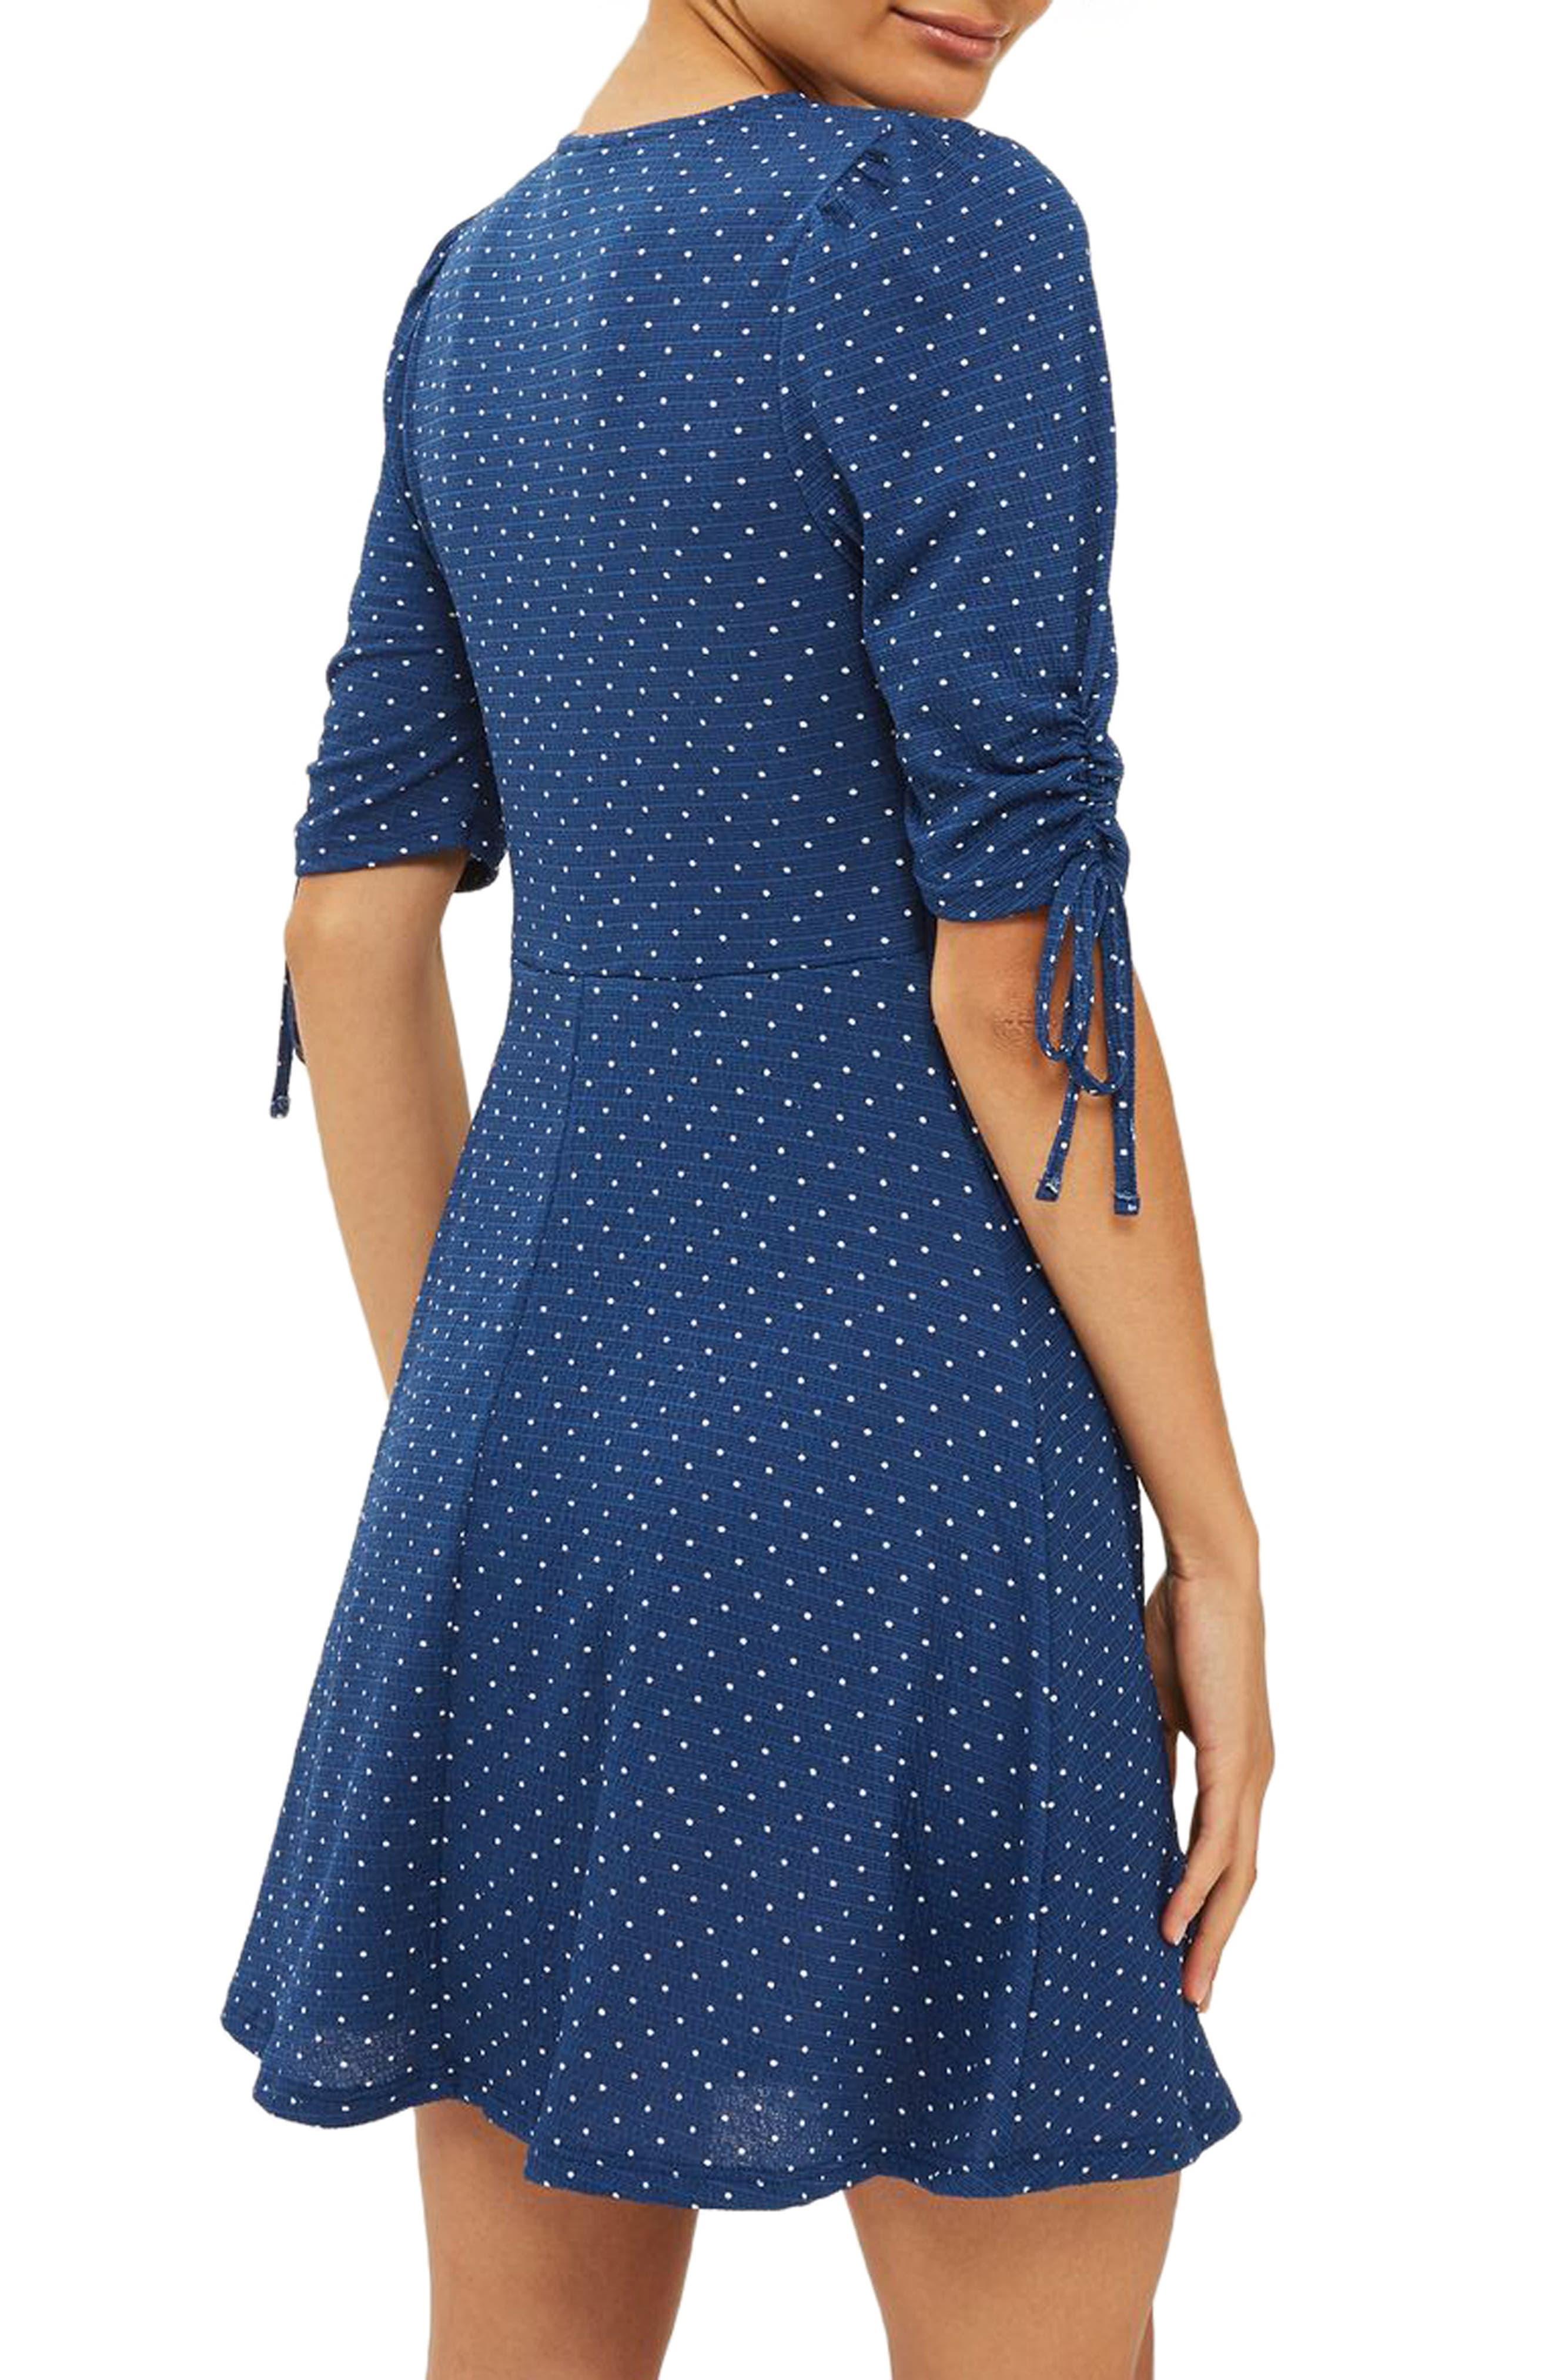 Polka Dot Tea Dress,                             Alternate thumbnail 2, color,